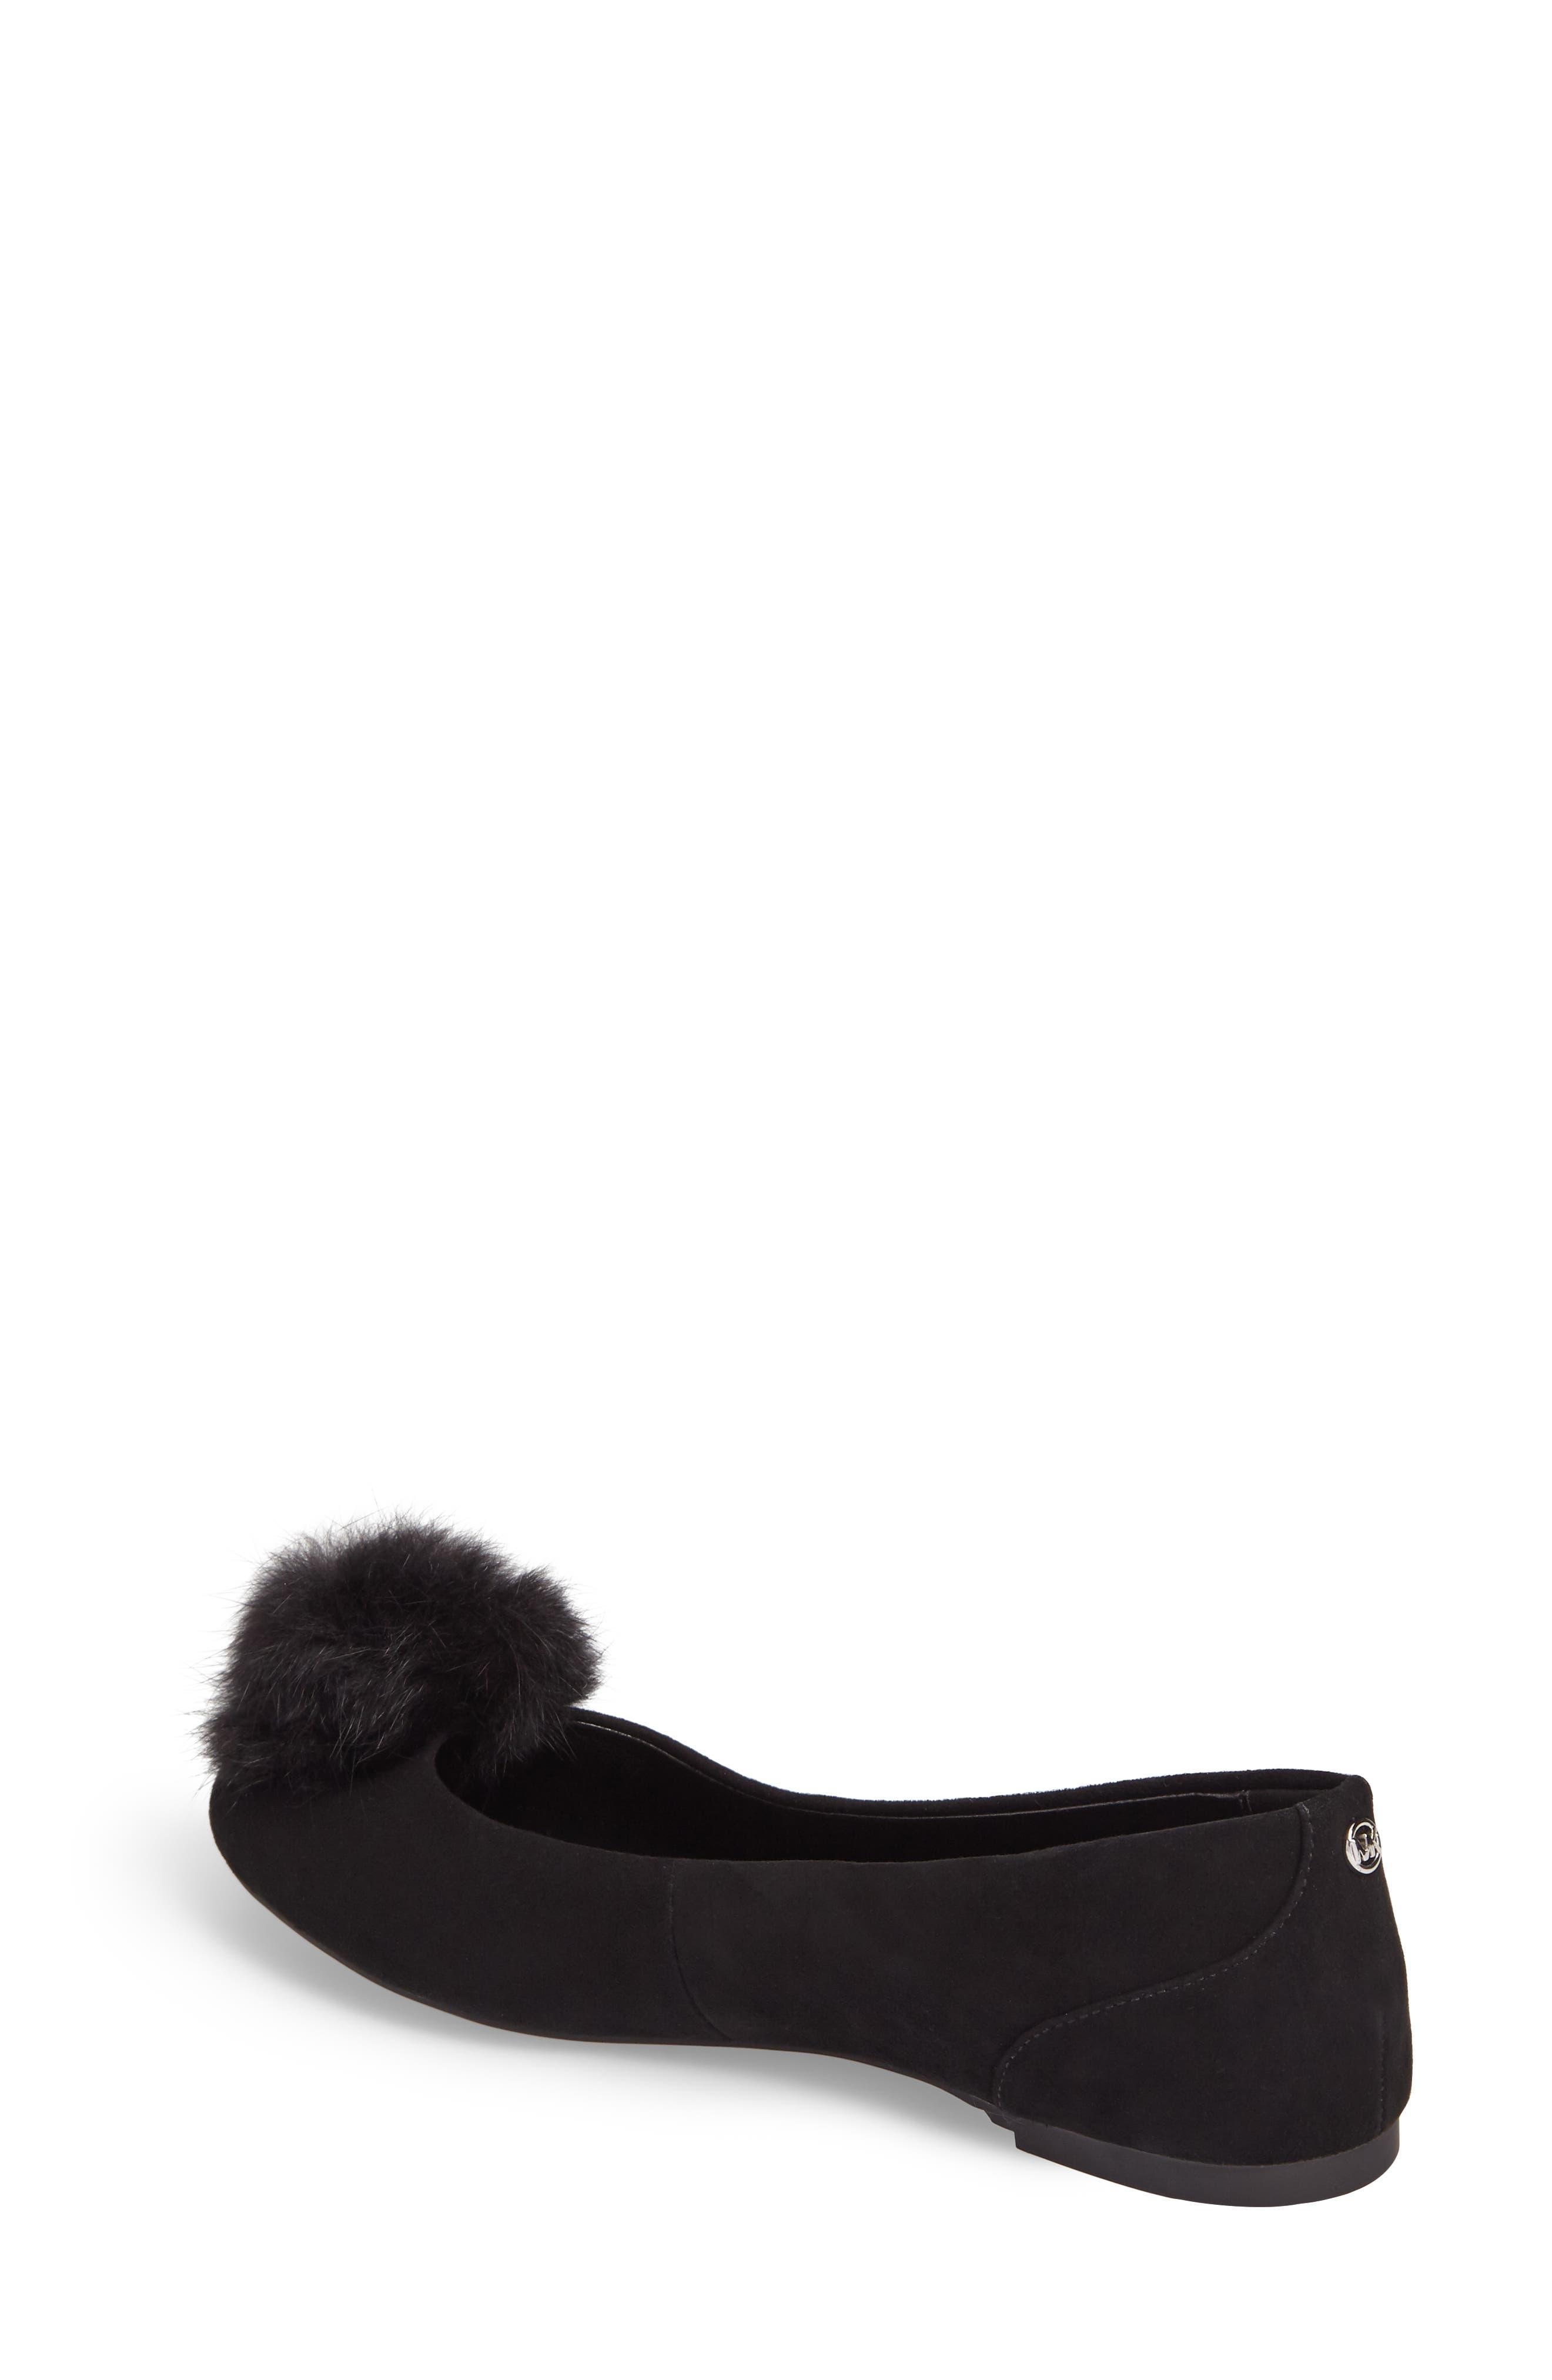 Remi Ballet Flat with Genuine Rabbit Fur Pom,                             Alternate thumbnail 2, color,                             Black Suede